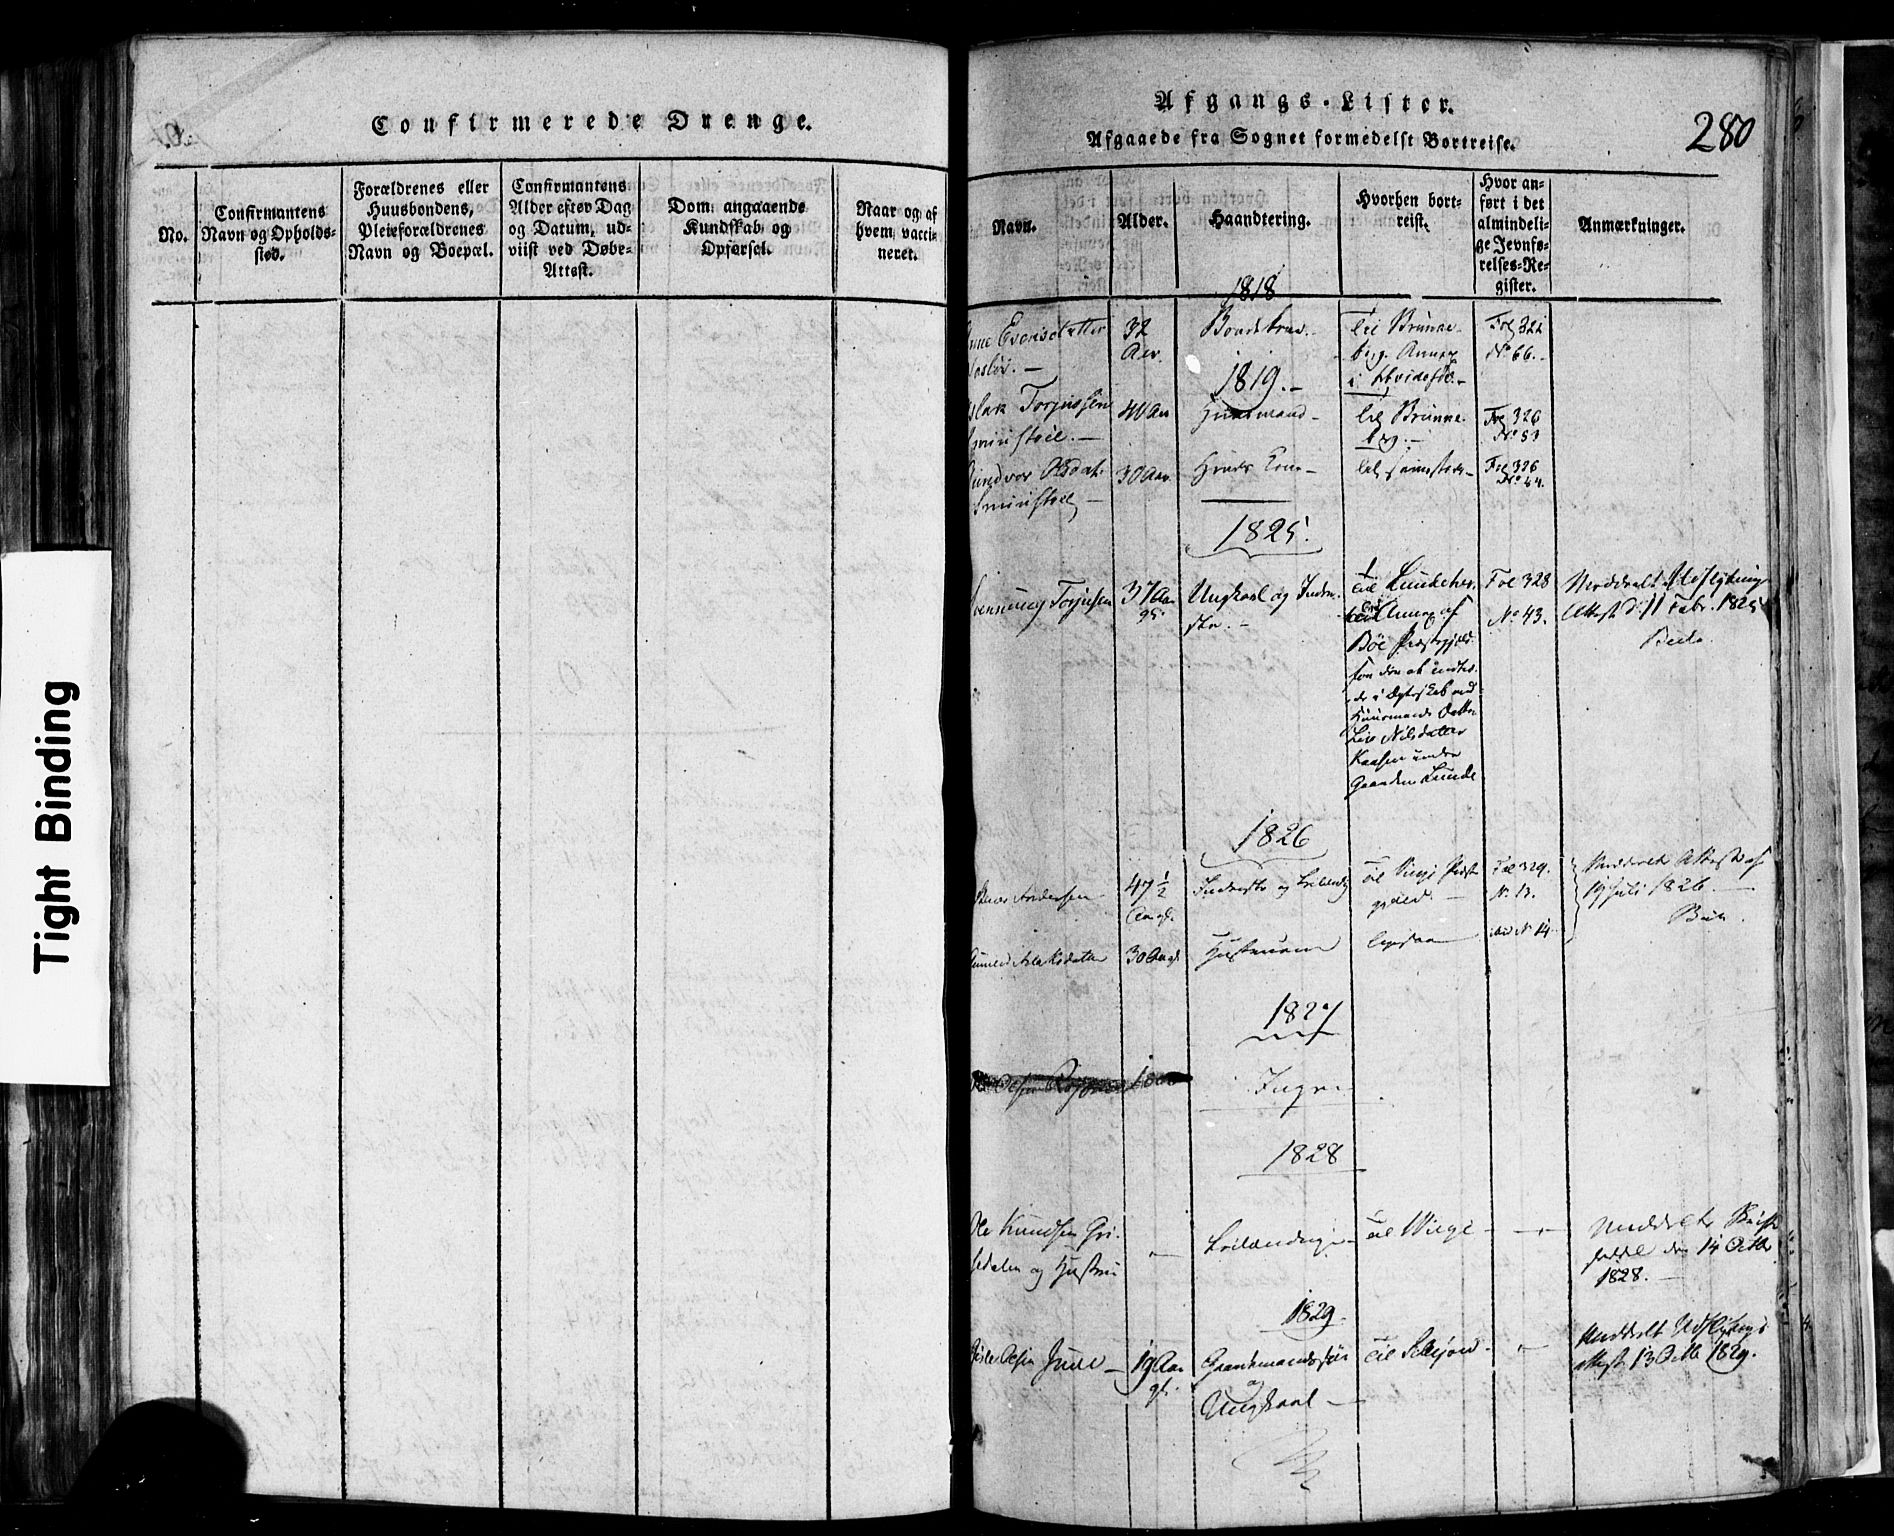 SAKO, Rauland kirkebøker, F/Fa/L0002: Ministerialbok nr. 2, 1815-1860, s. 280